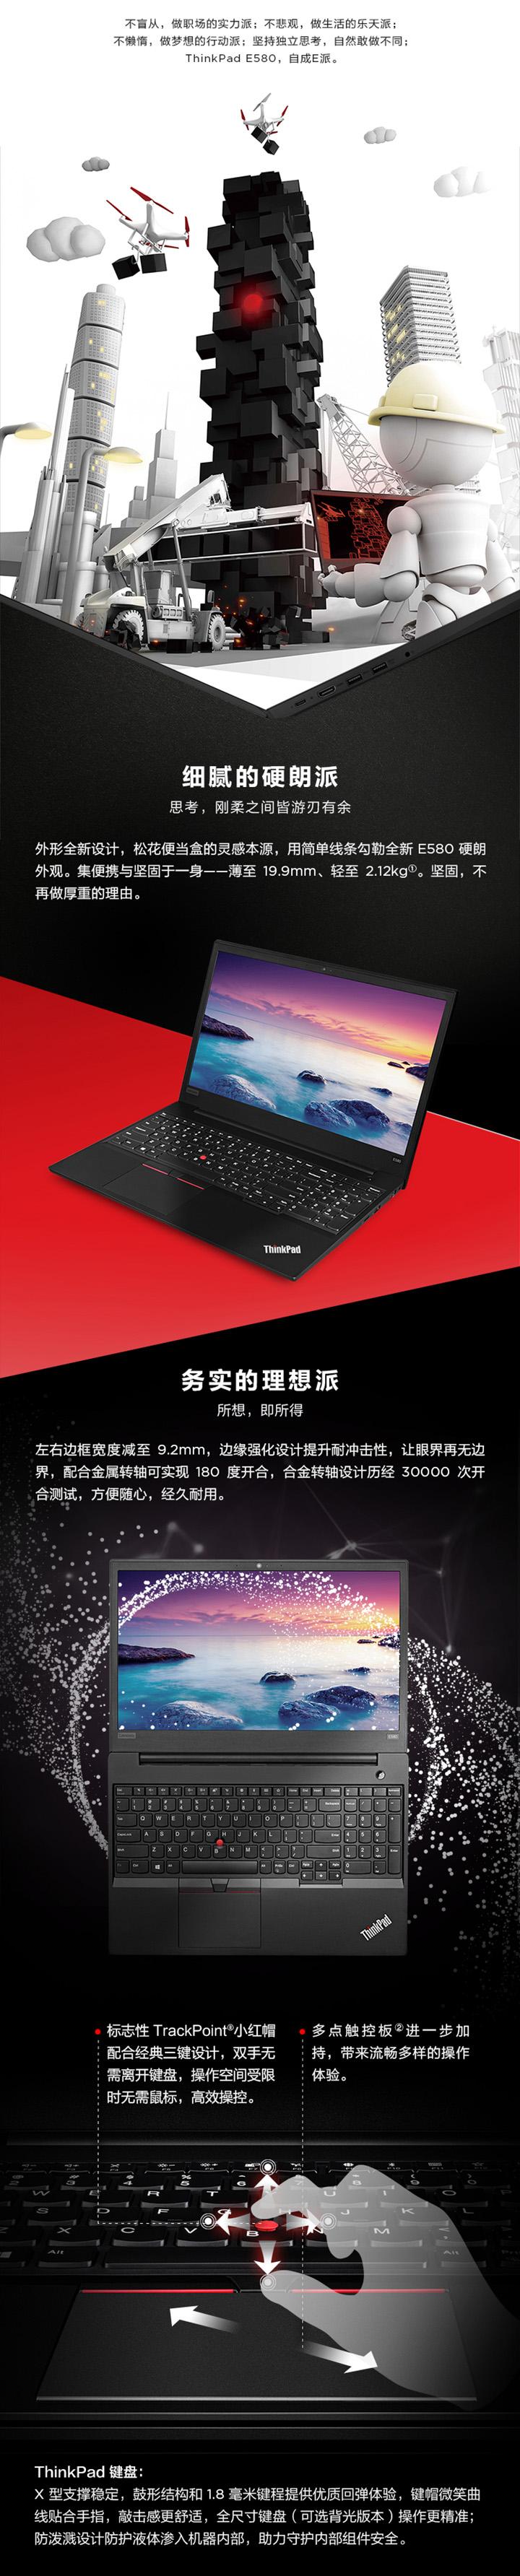 ThinkPad E580笔记本电脑免费试用,评测